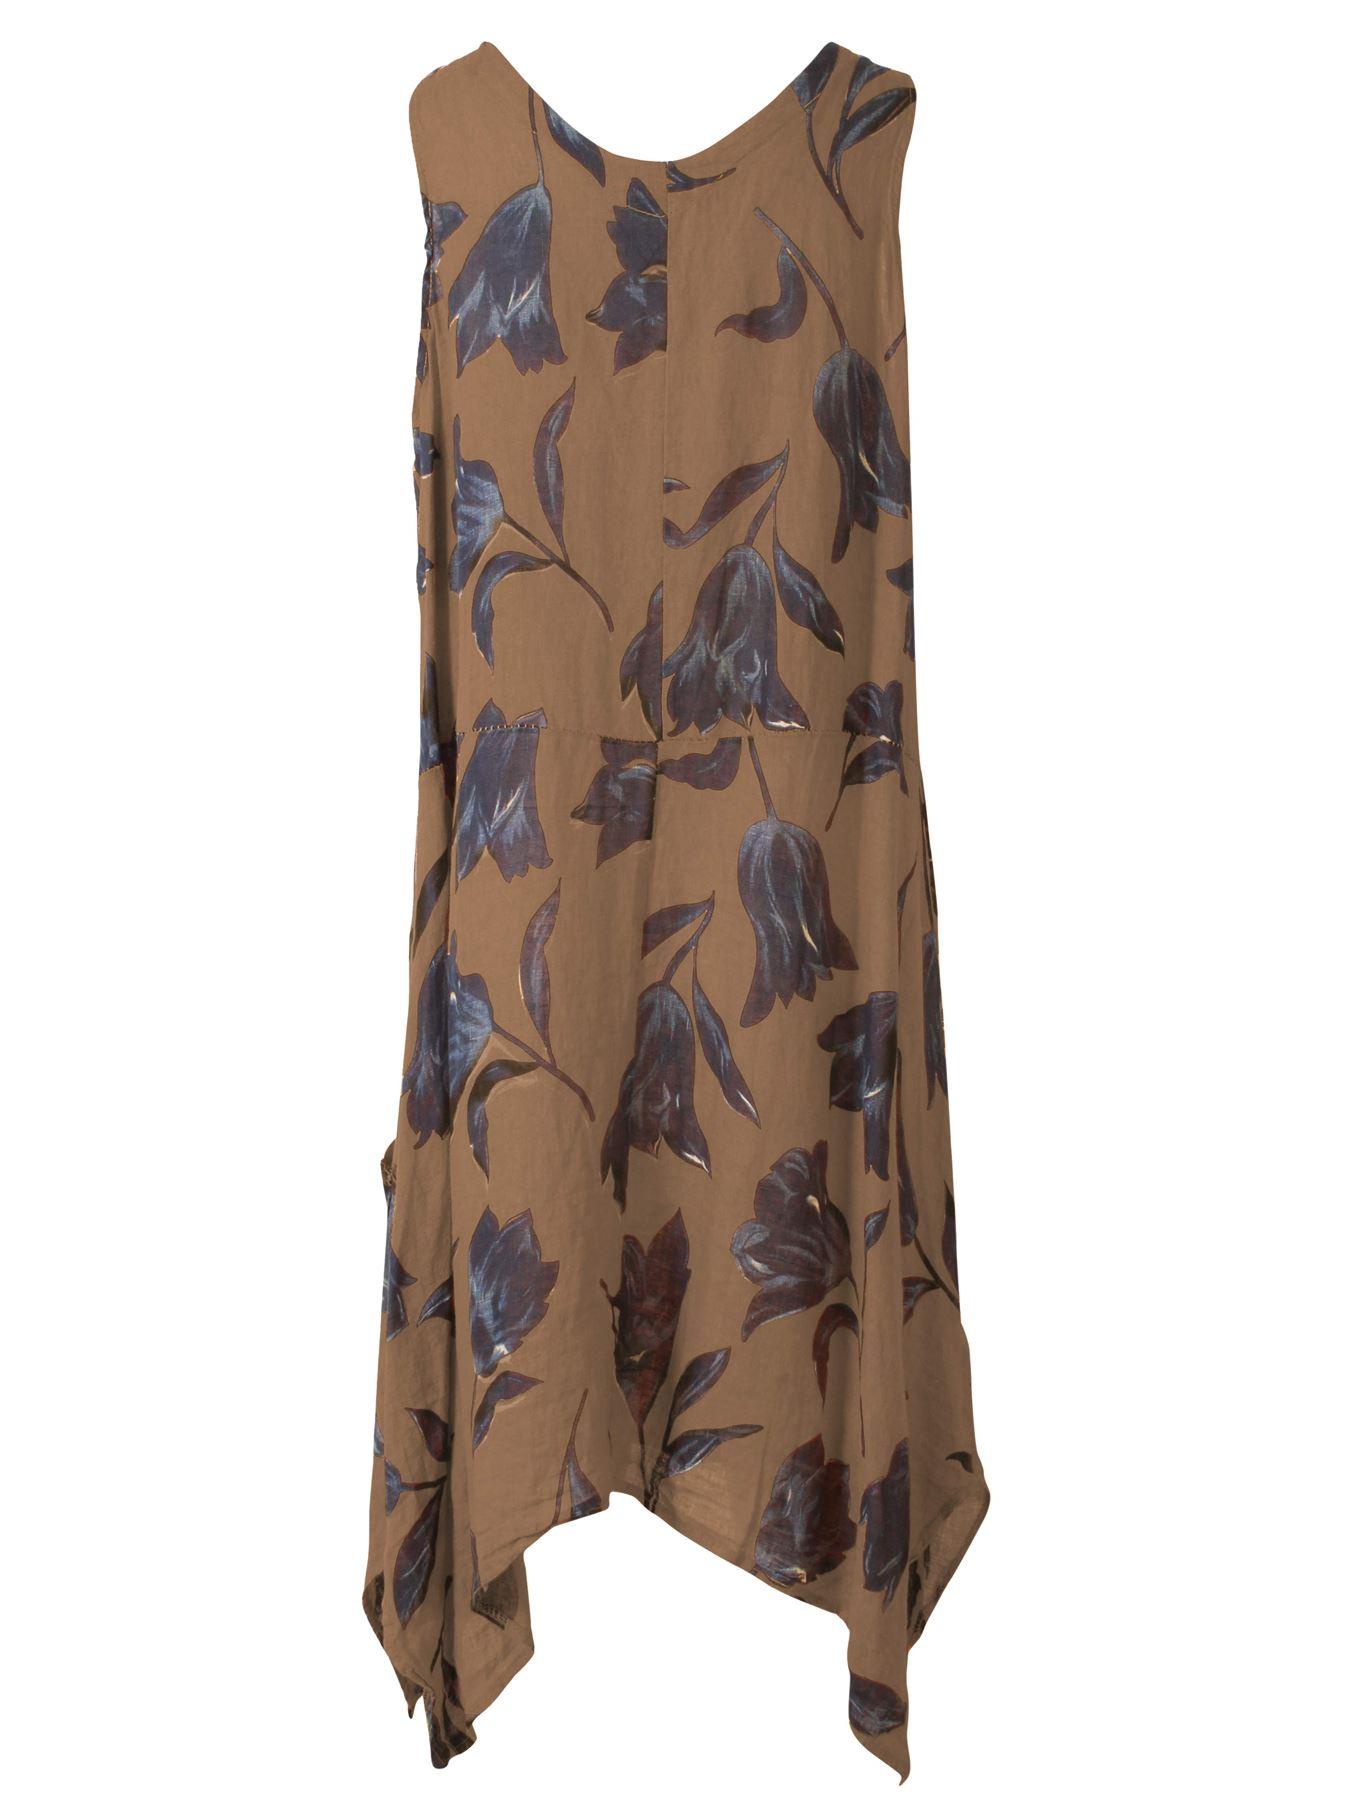 Womens-Tulip-Floral-Print-Italian-Lagenlook-Ladies-Linen-Dress-Two-Button-V-Neck thumbnail 15